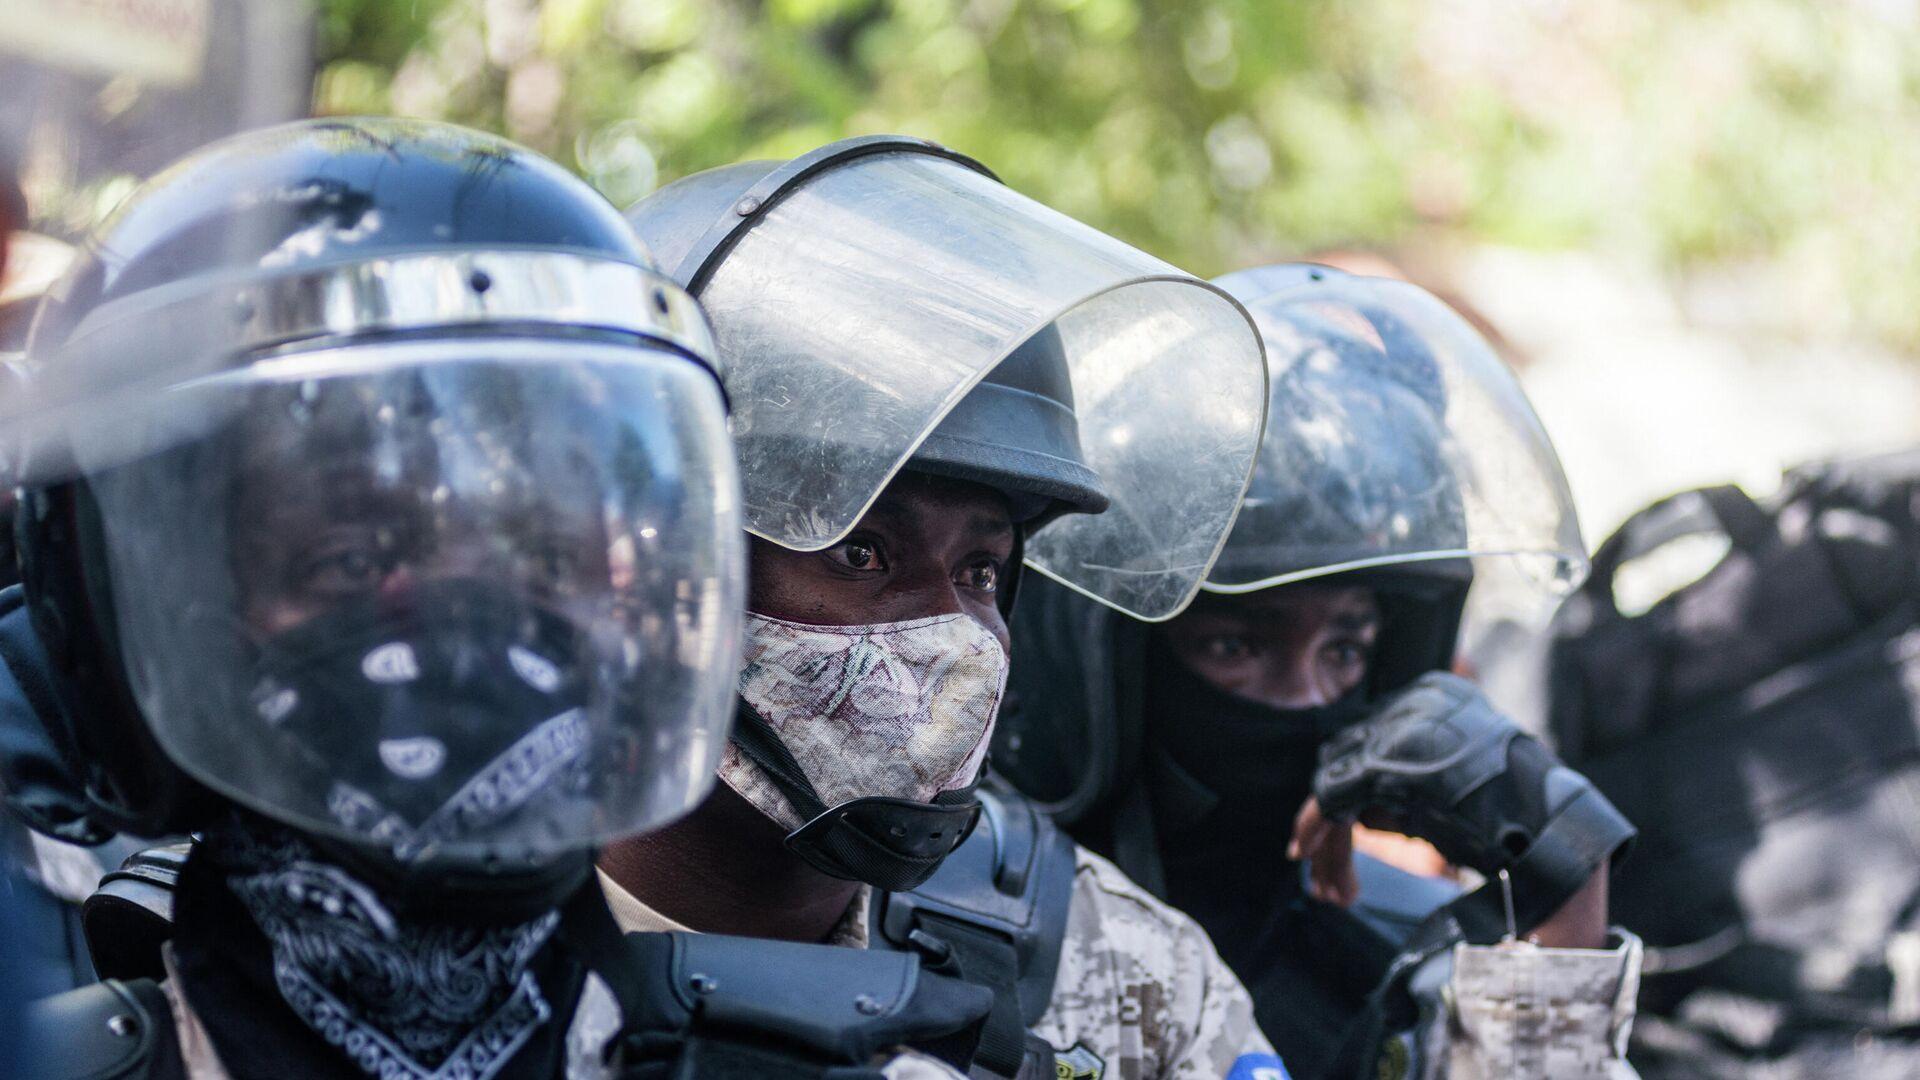 La Policía durante las protestas en Haití - Sputnik Mundo, 1920, 16.03.2021